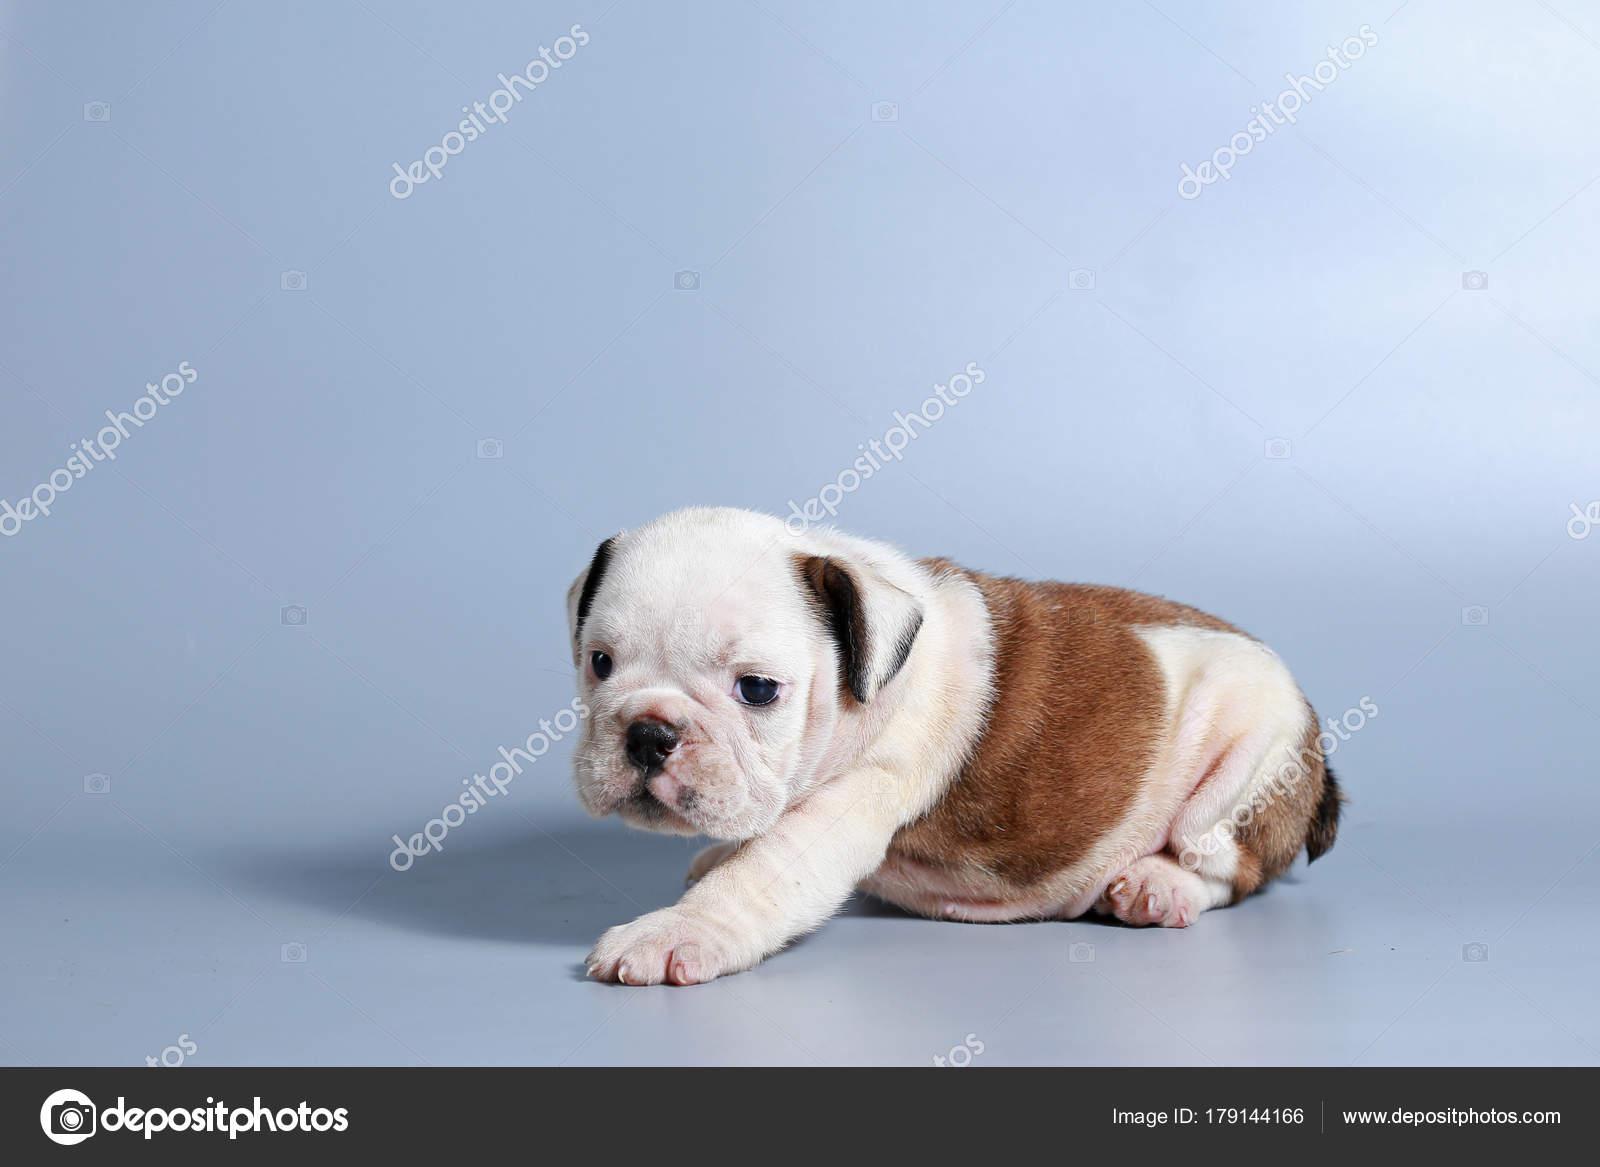 Meses Raça Bulldog Inglês Filhote Cachorro Tela Cinza Stock Photo